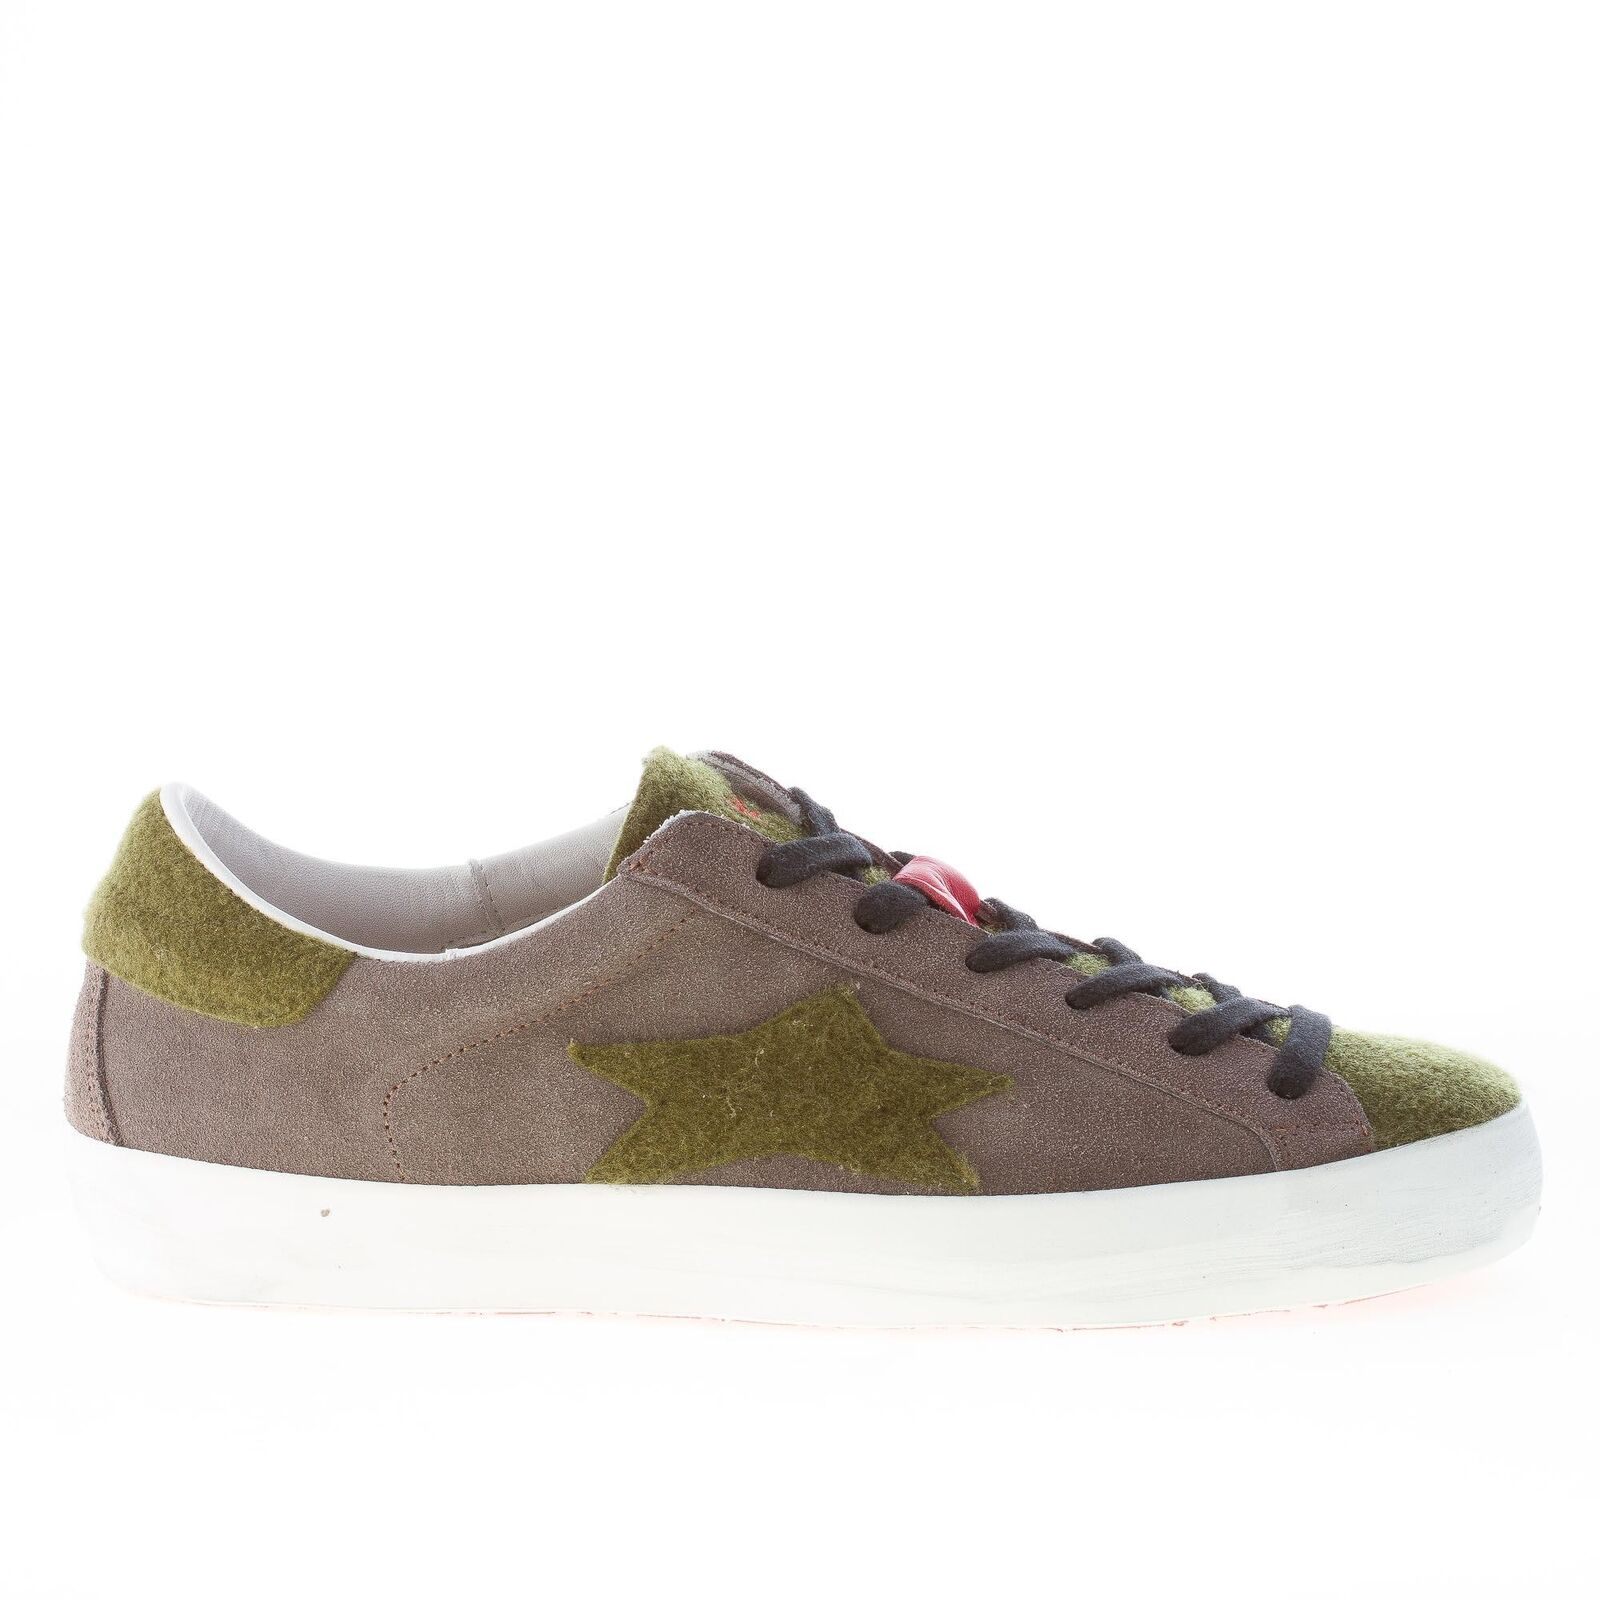 ISHIKAWA herren schuhe Low 1215 grey wildleder sneaker green filz made in